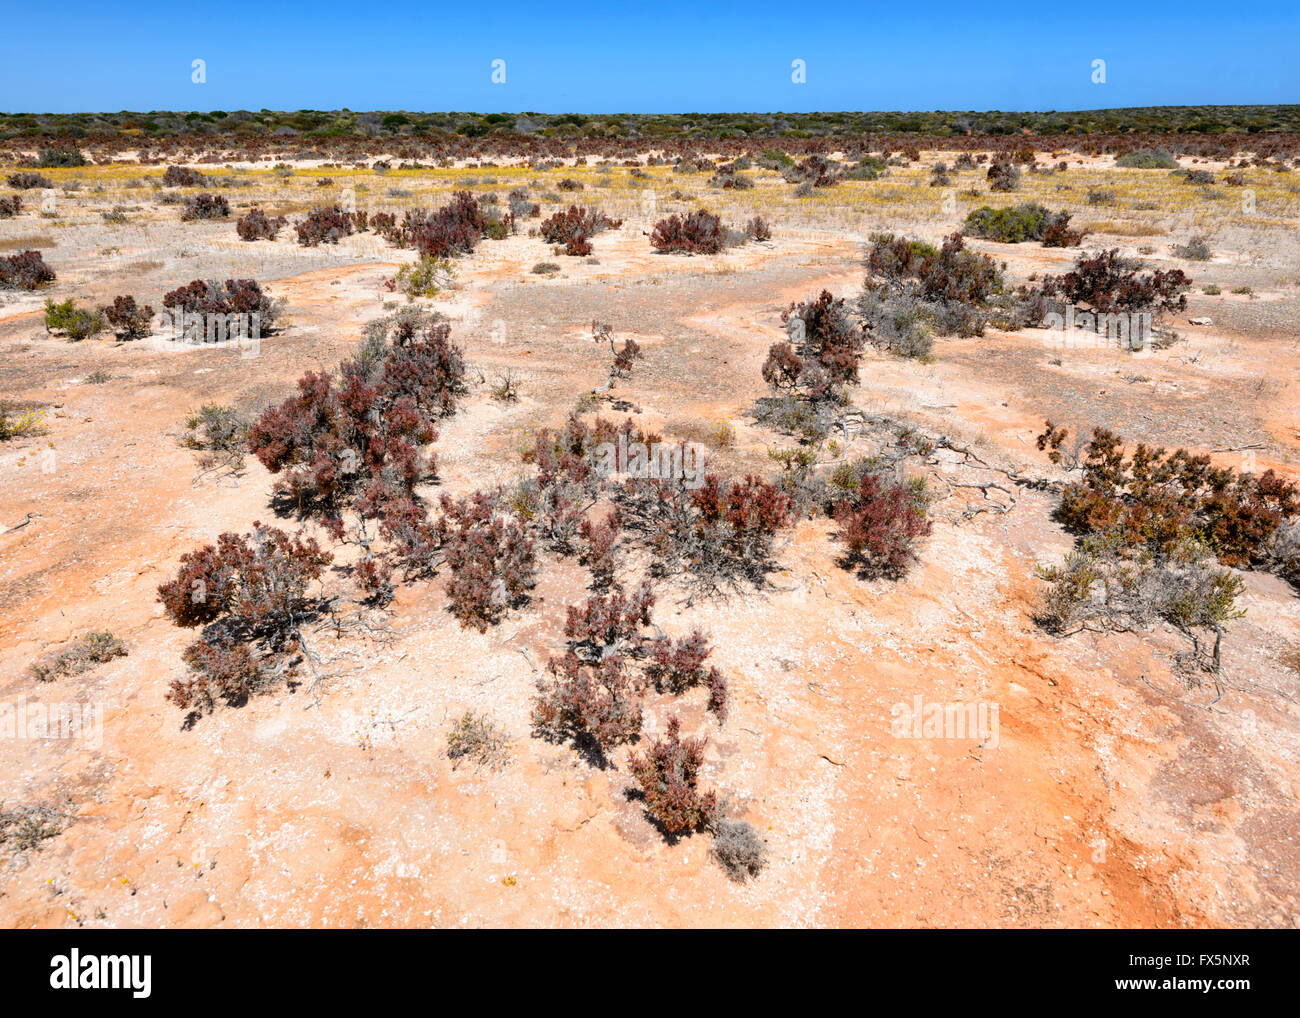 Árida tierra árida de la costa noroeste de Australia Occidental, WA, Australia Imagen De Stock